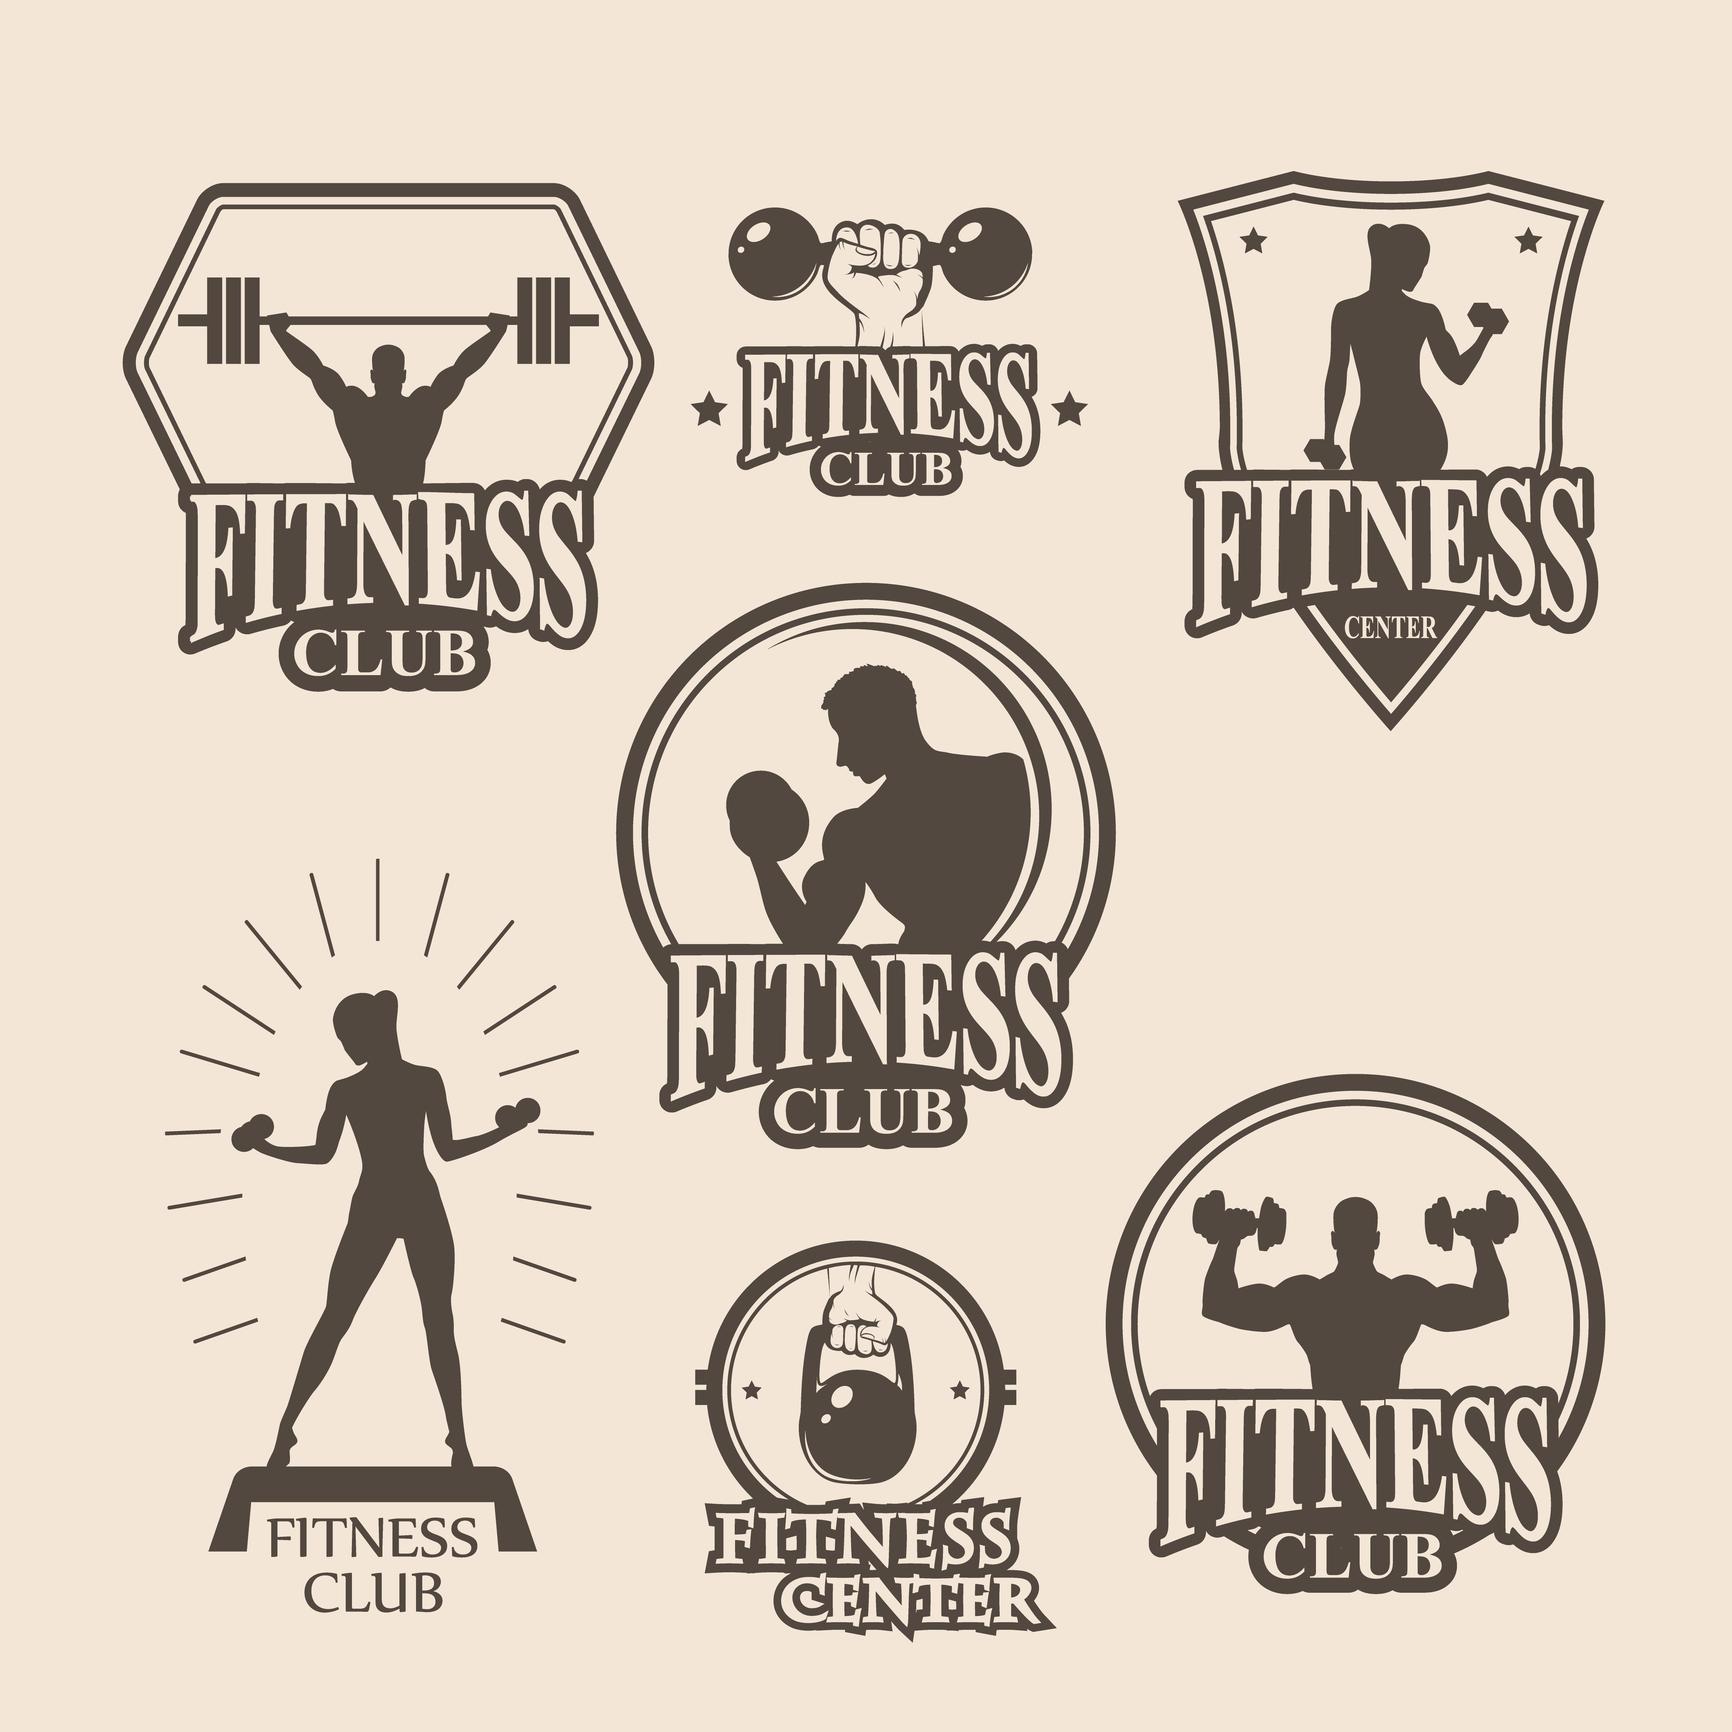 Design Elements of a Fitness Logo That Motivates • Online.